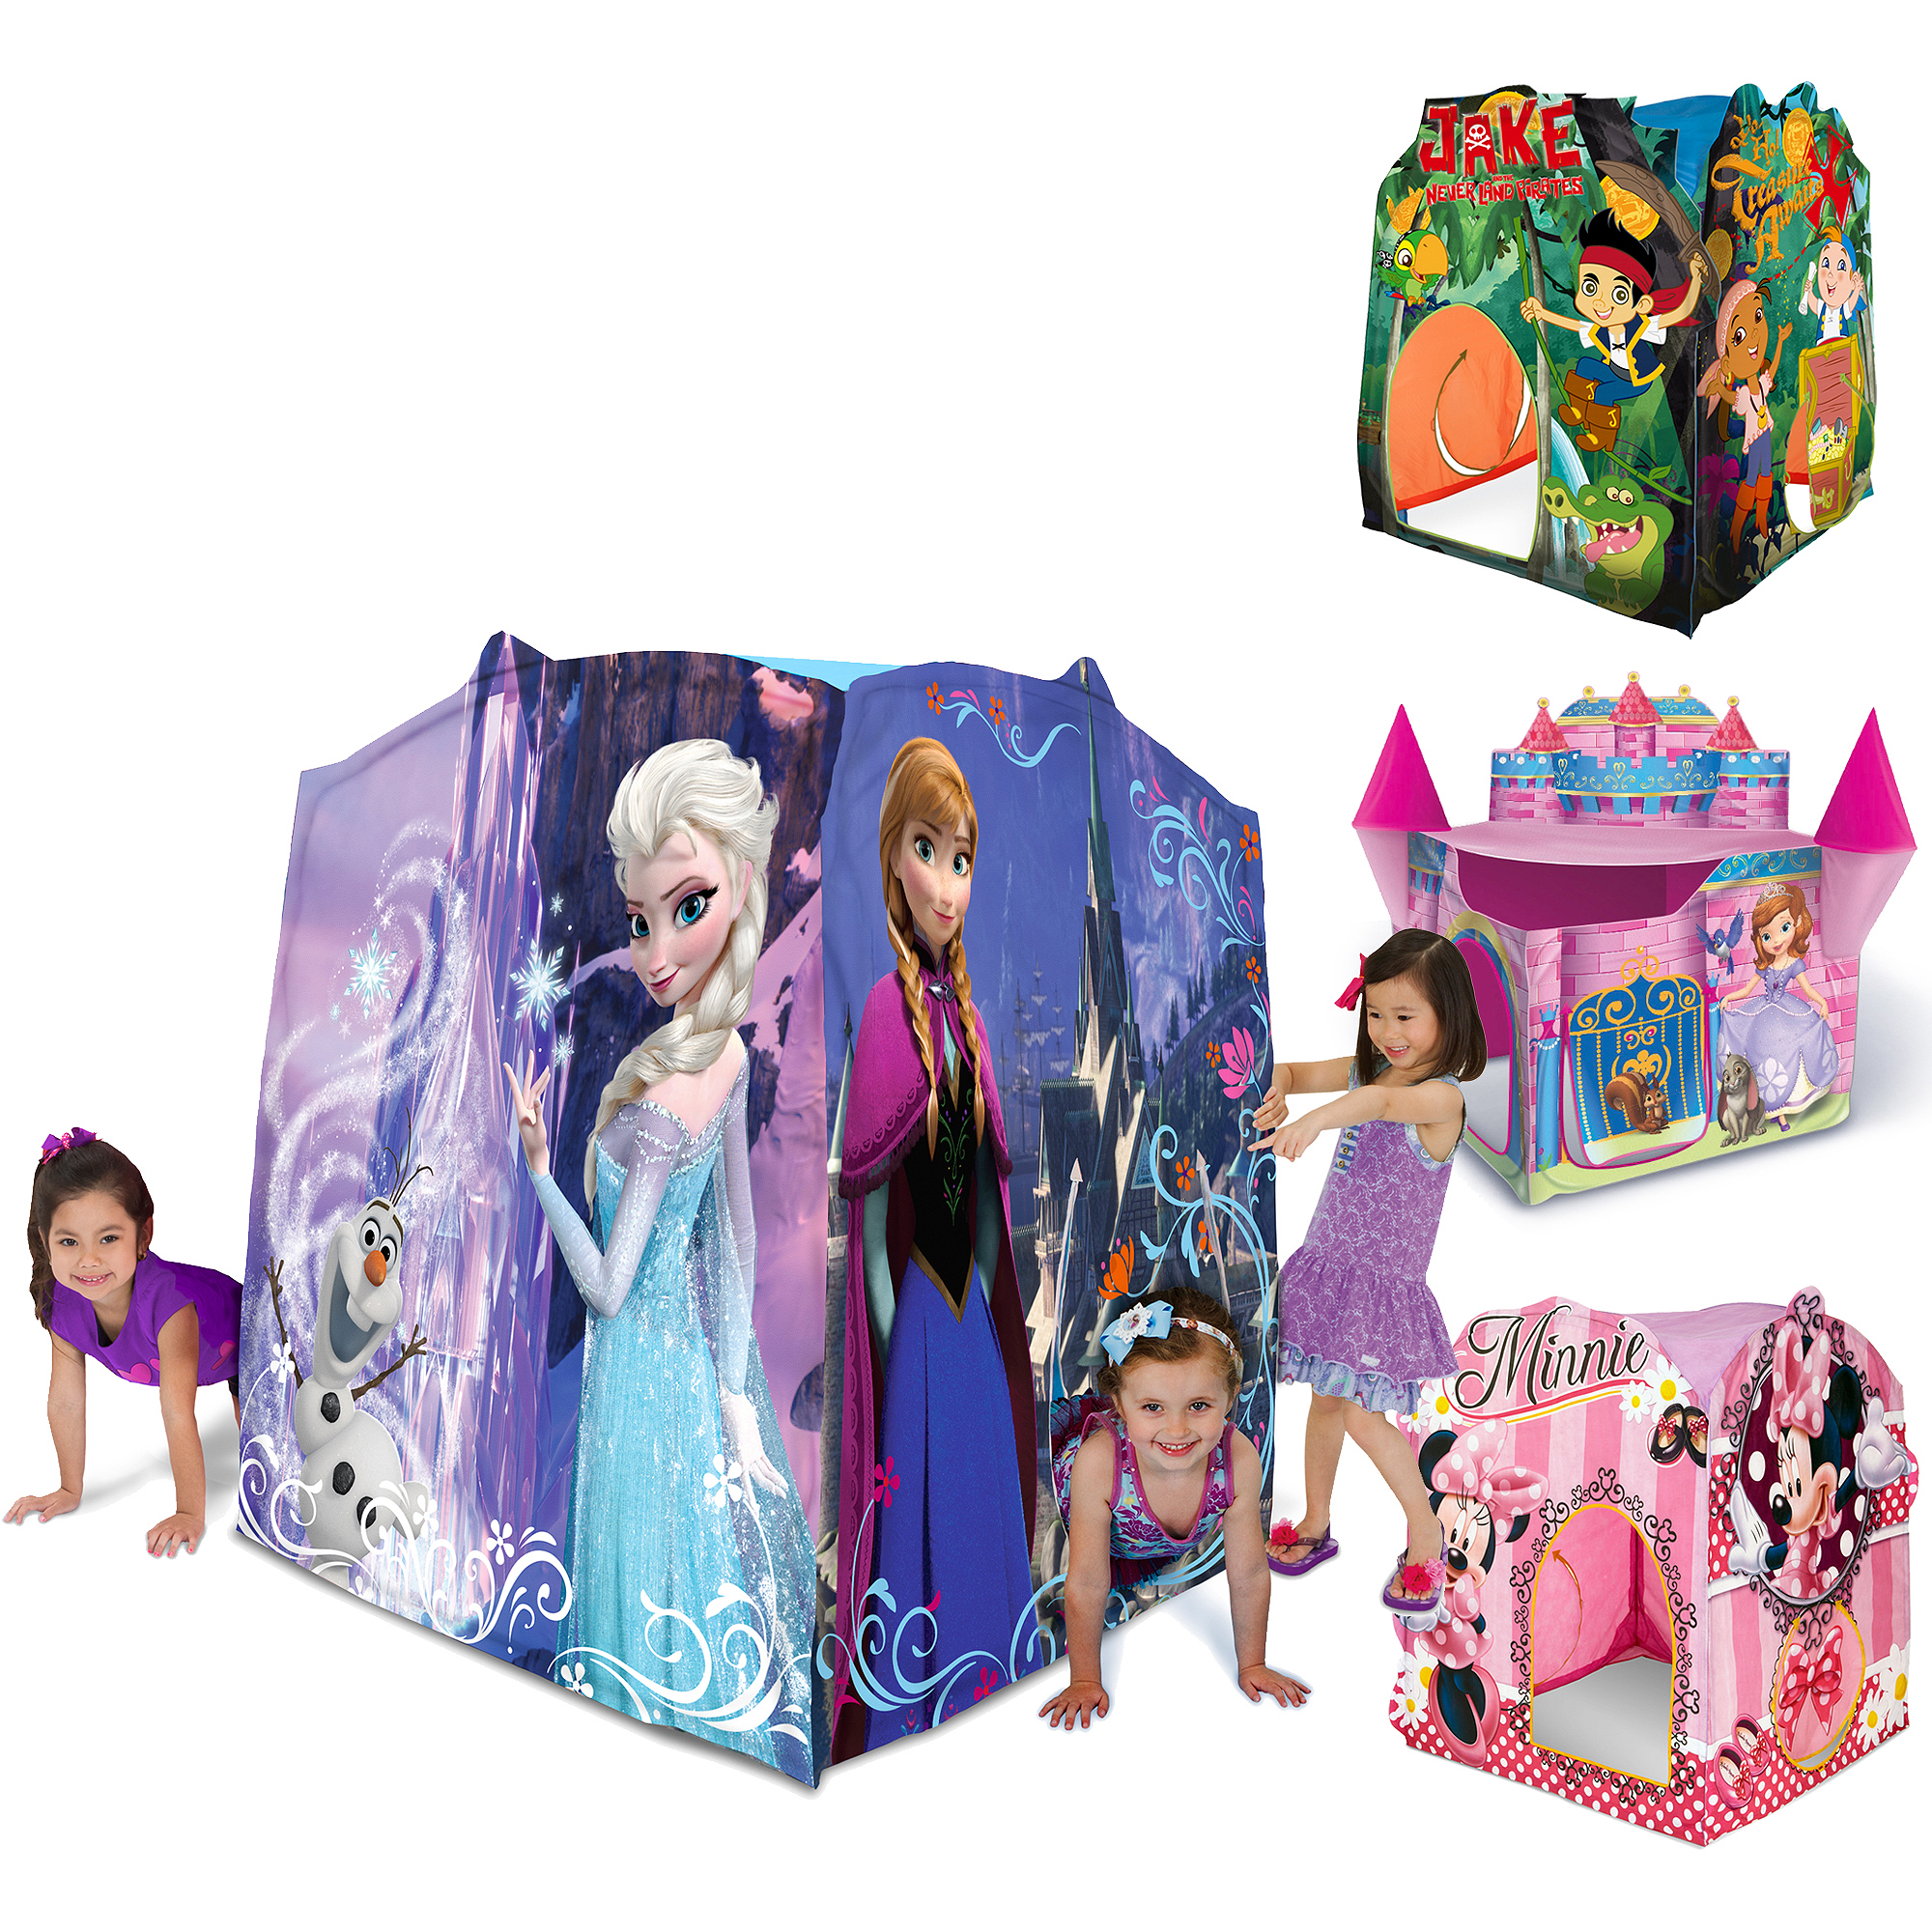 Disney Play Tent Characters- Frozen, Sofia, Jake, & Minnie